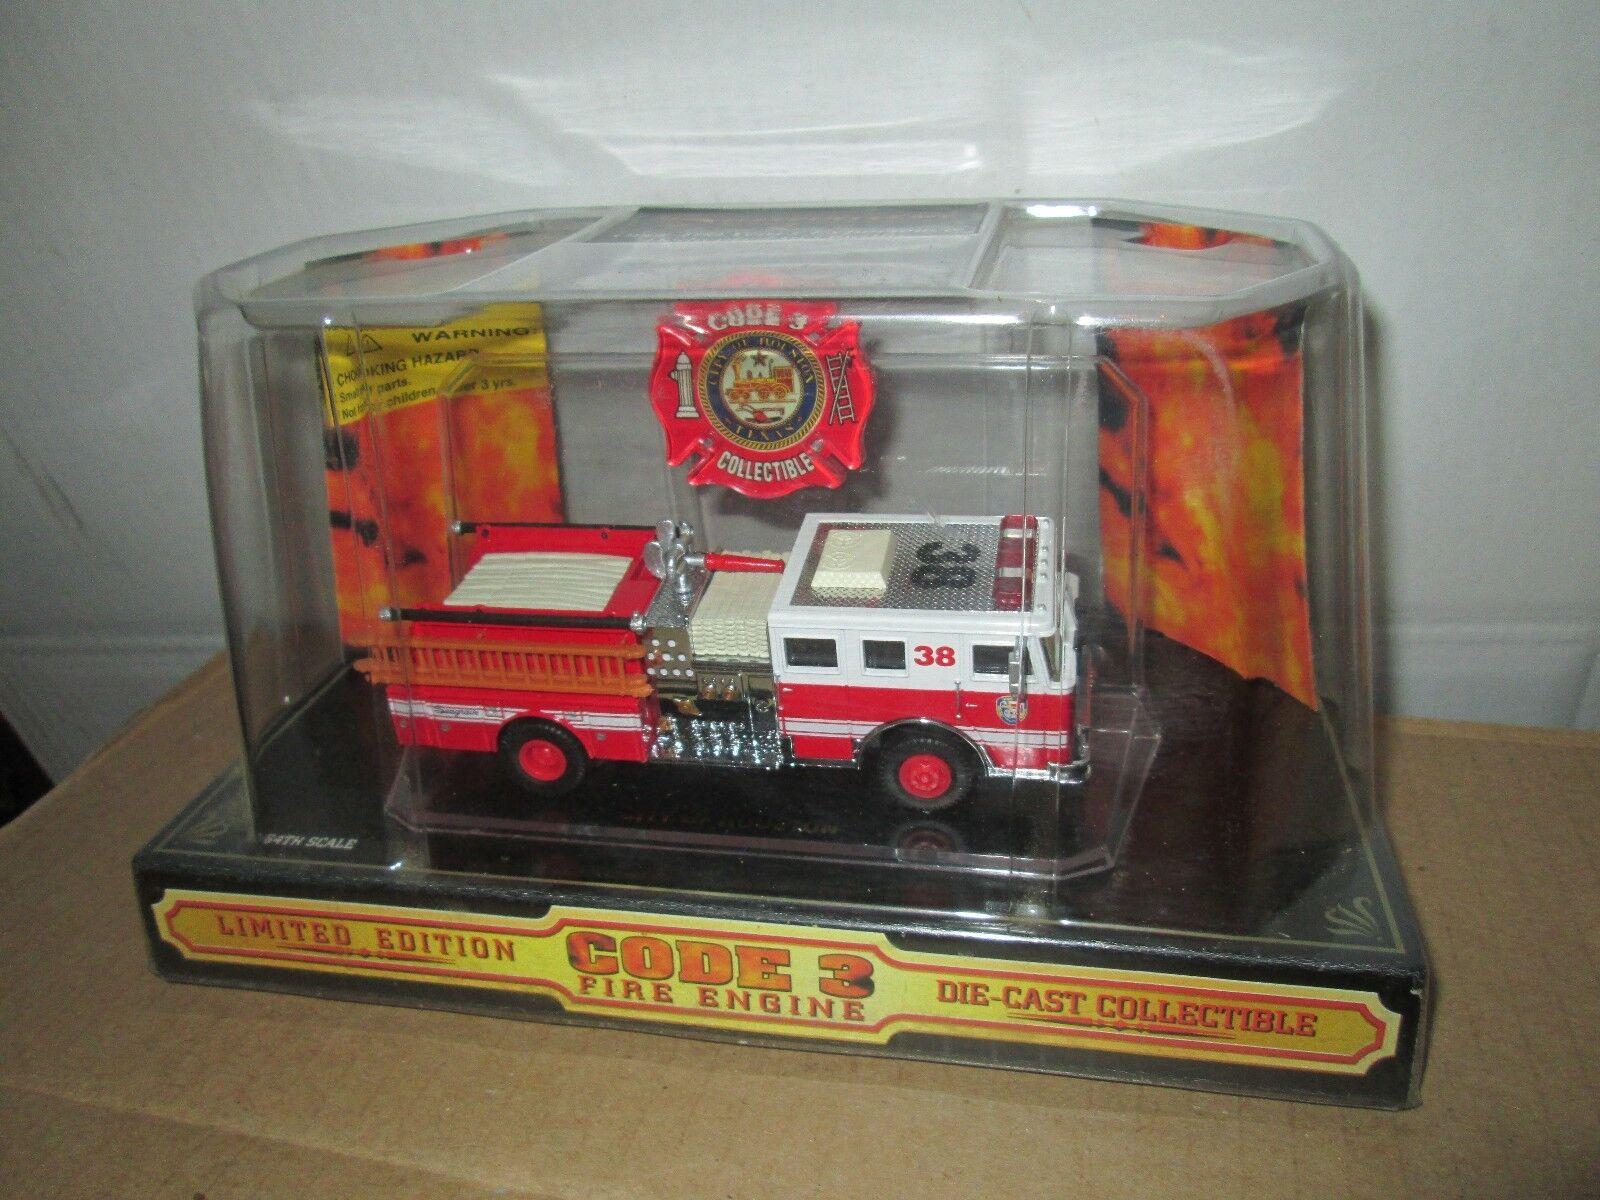 City of Houston CODE 3 seagrave pumper 1 64 64 64 Fire Dept unit 38   02451 truck a4b896